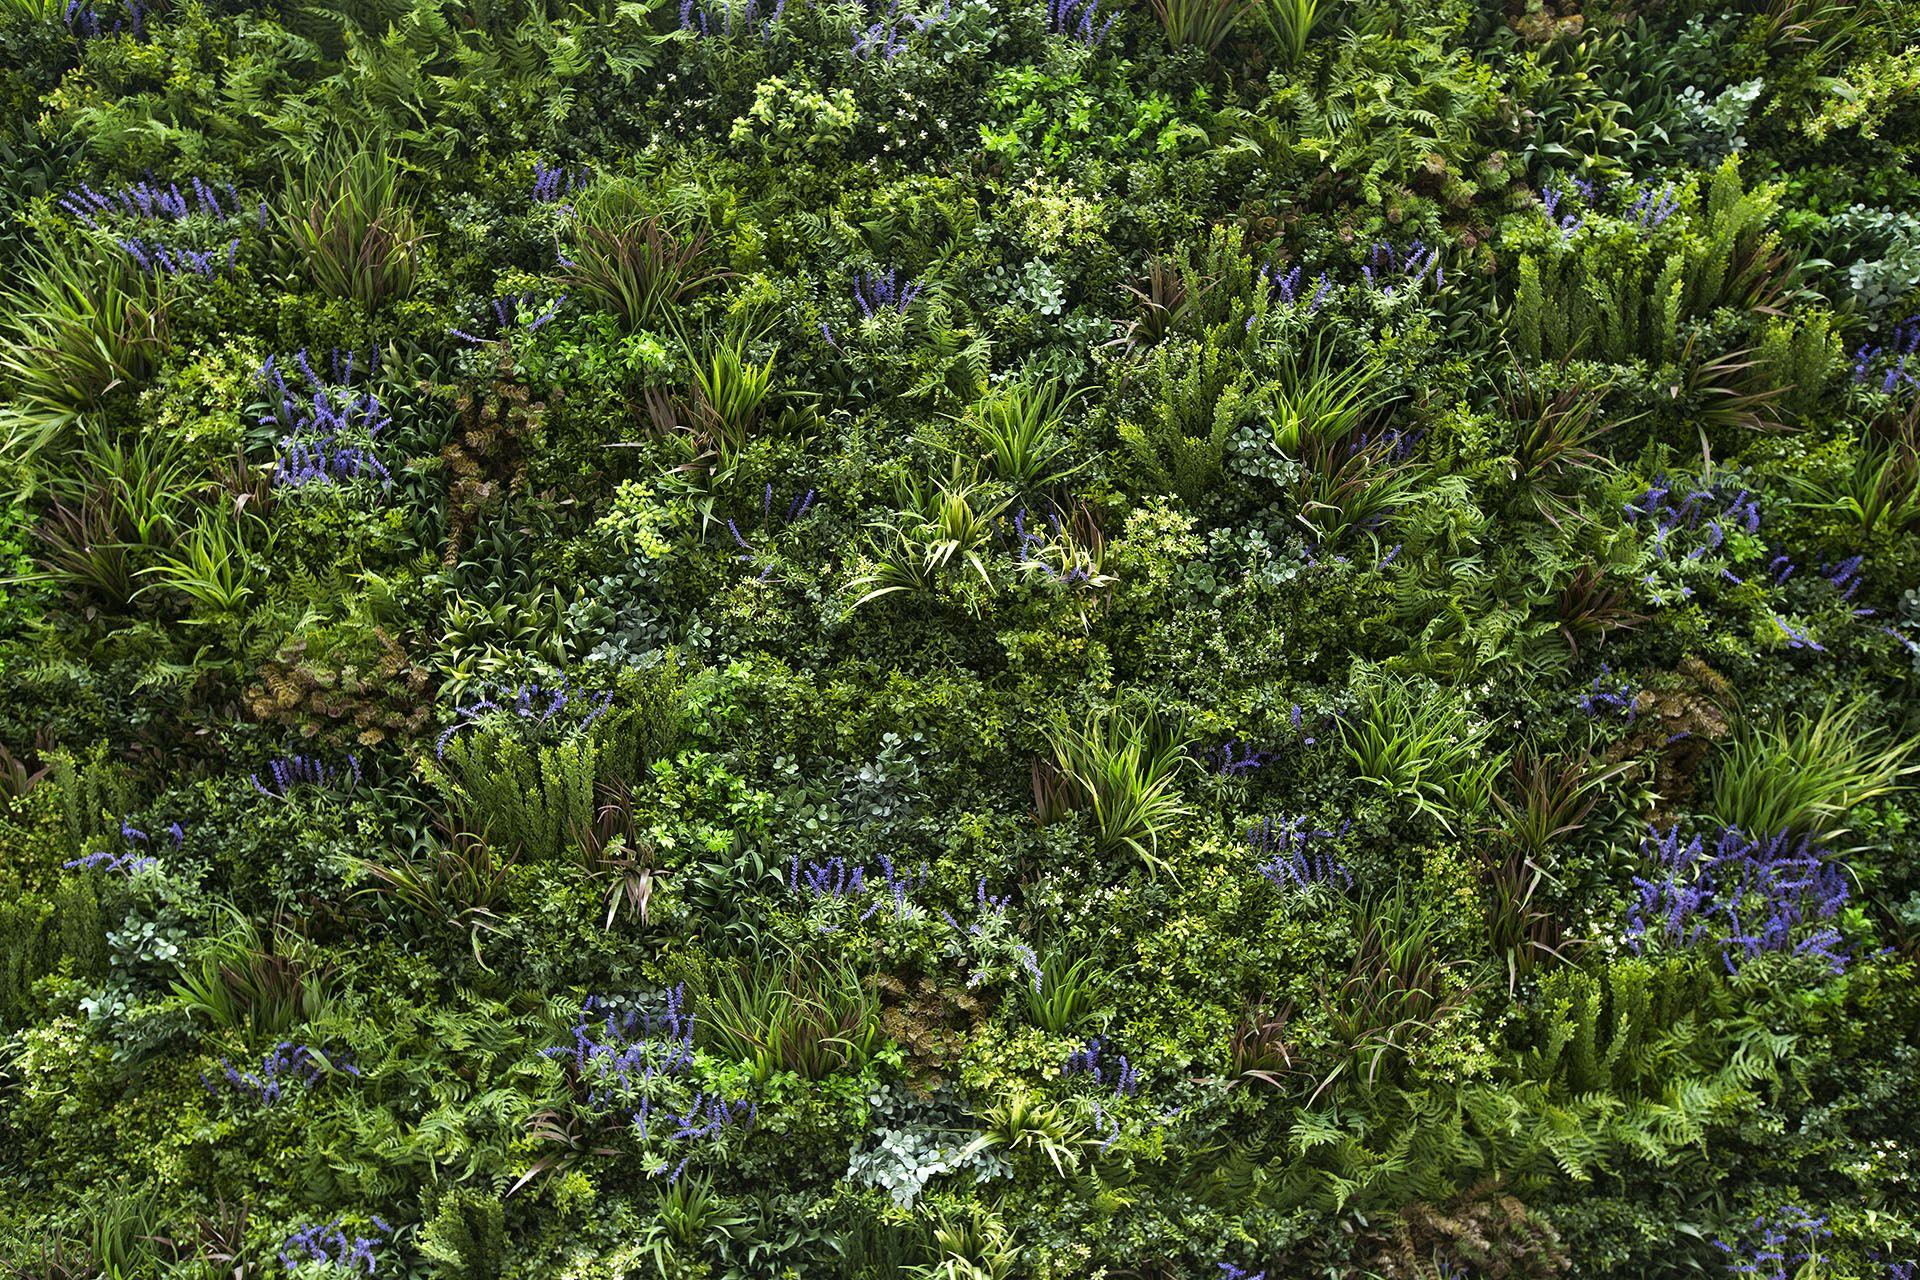 Green Walls Artificial Wall Garden Design Photography Architecture